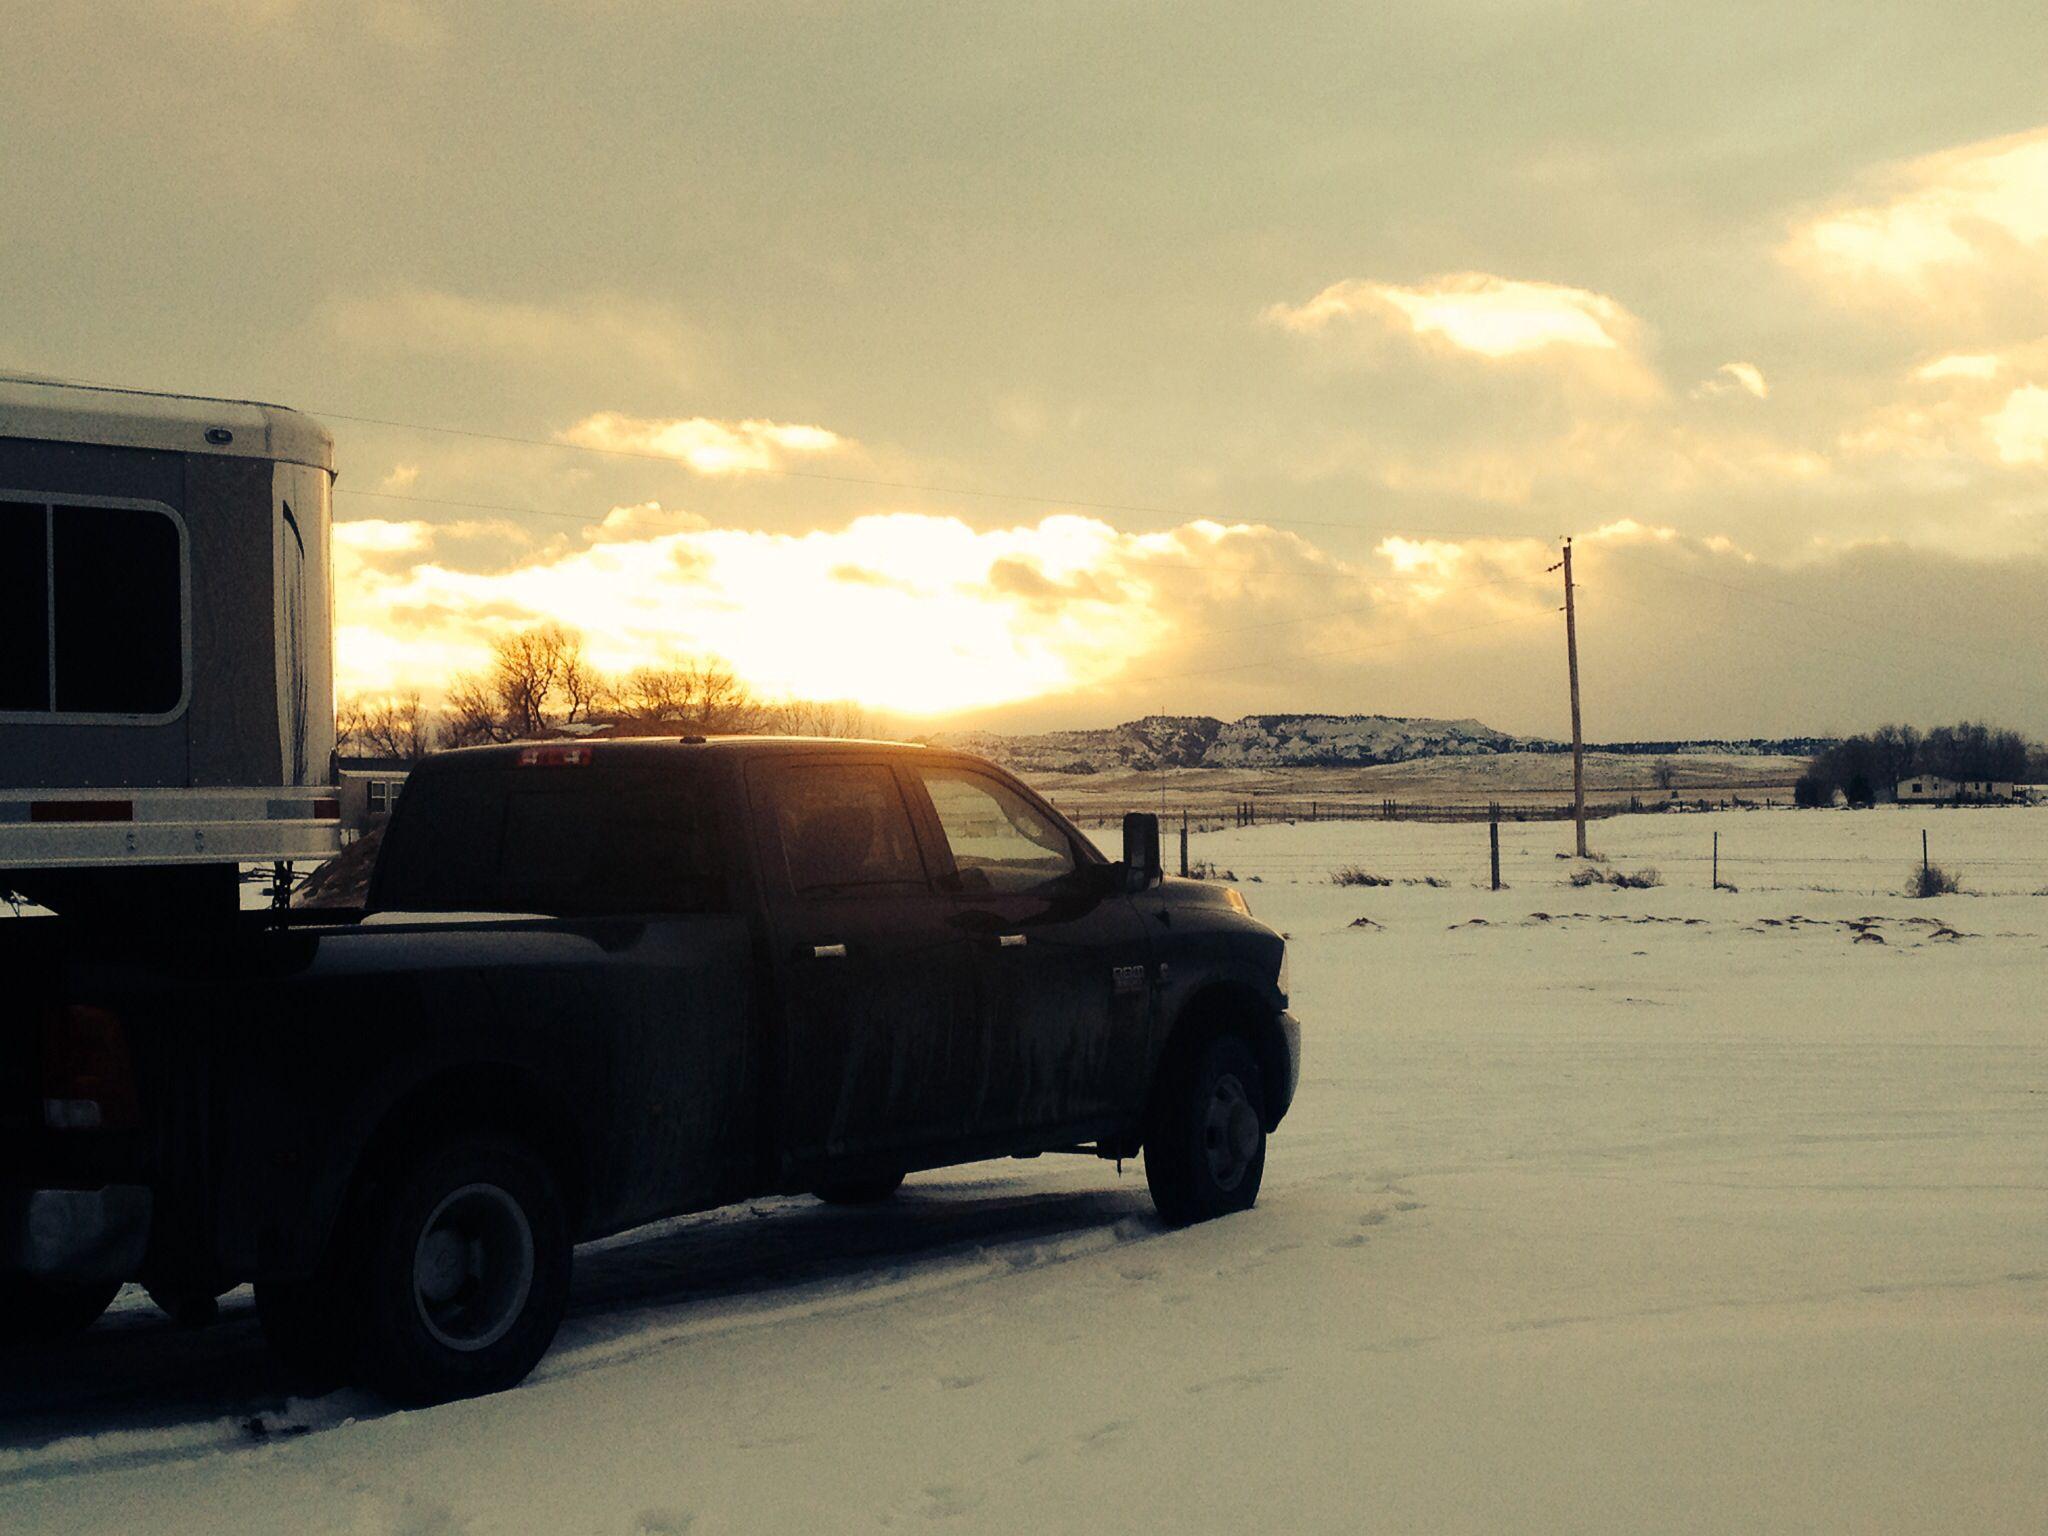 Dodge ram dually pulling 40 ft horse trailer Love my pickup